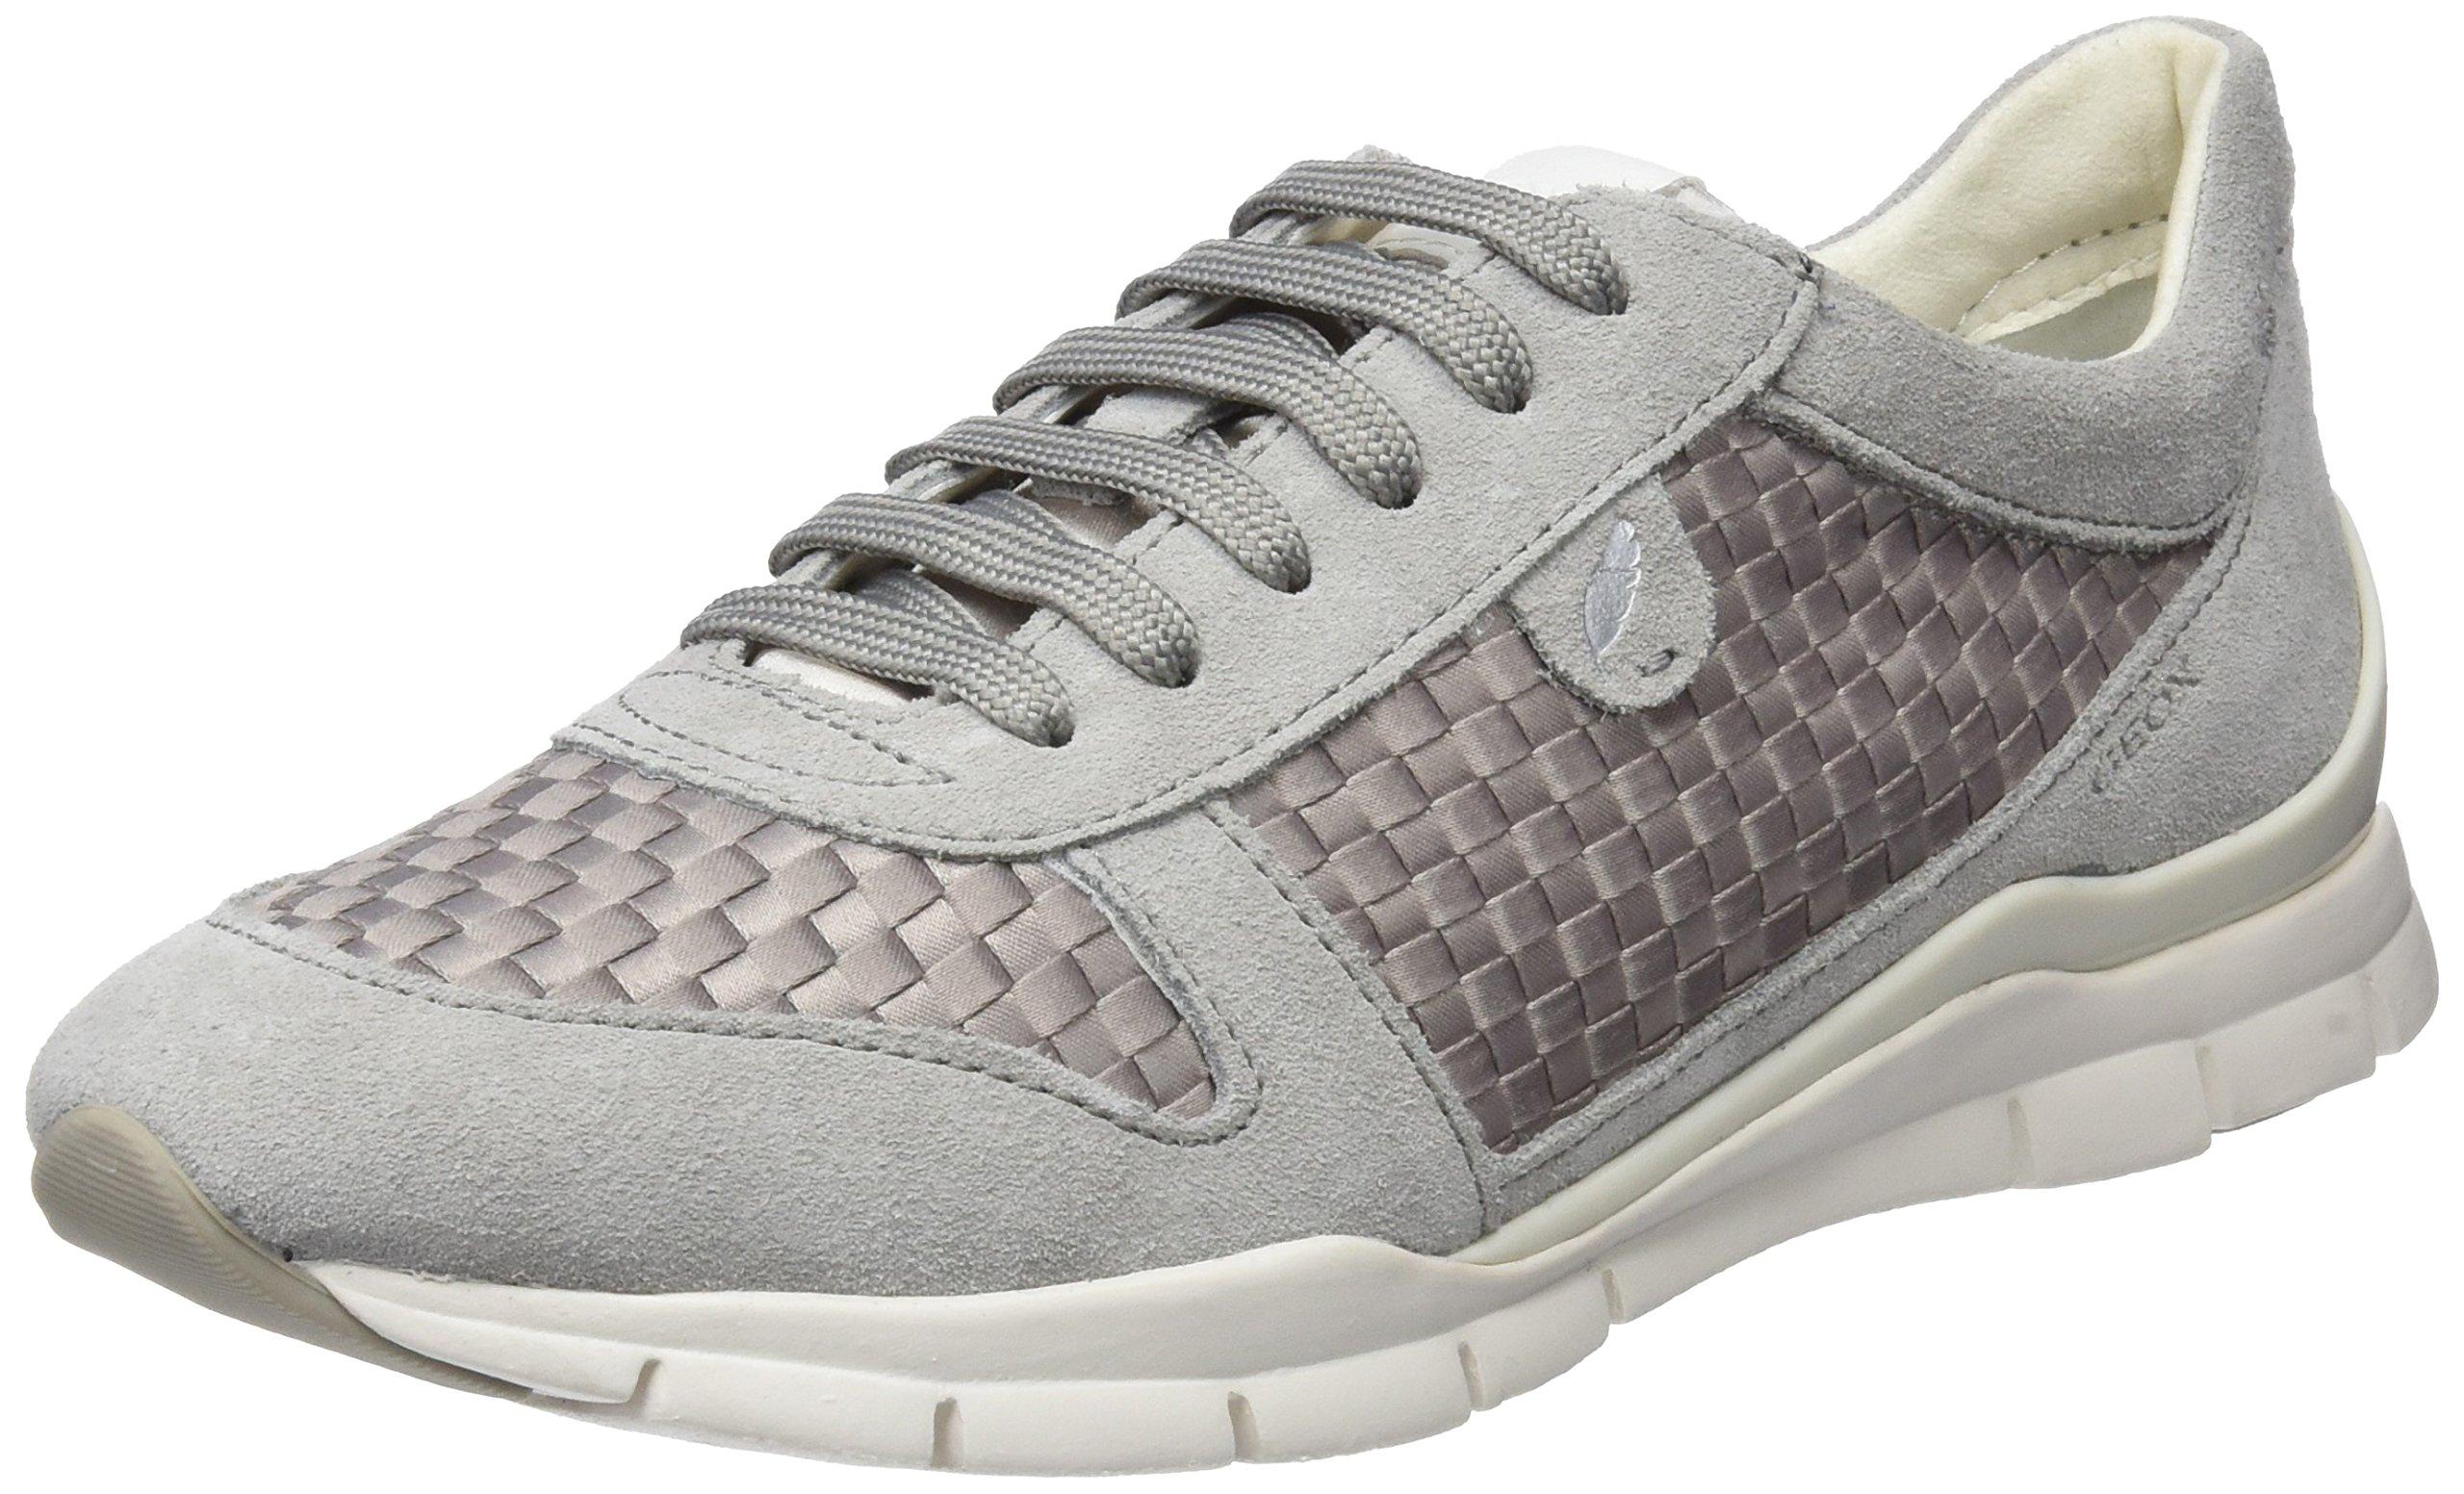 D Eu Sukie ASneakers Grey38 Geox FemmeGrislt Basses cTlJF1K